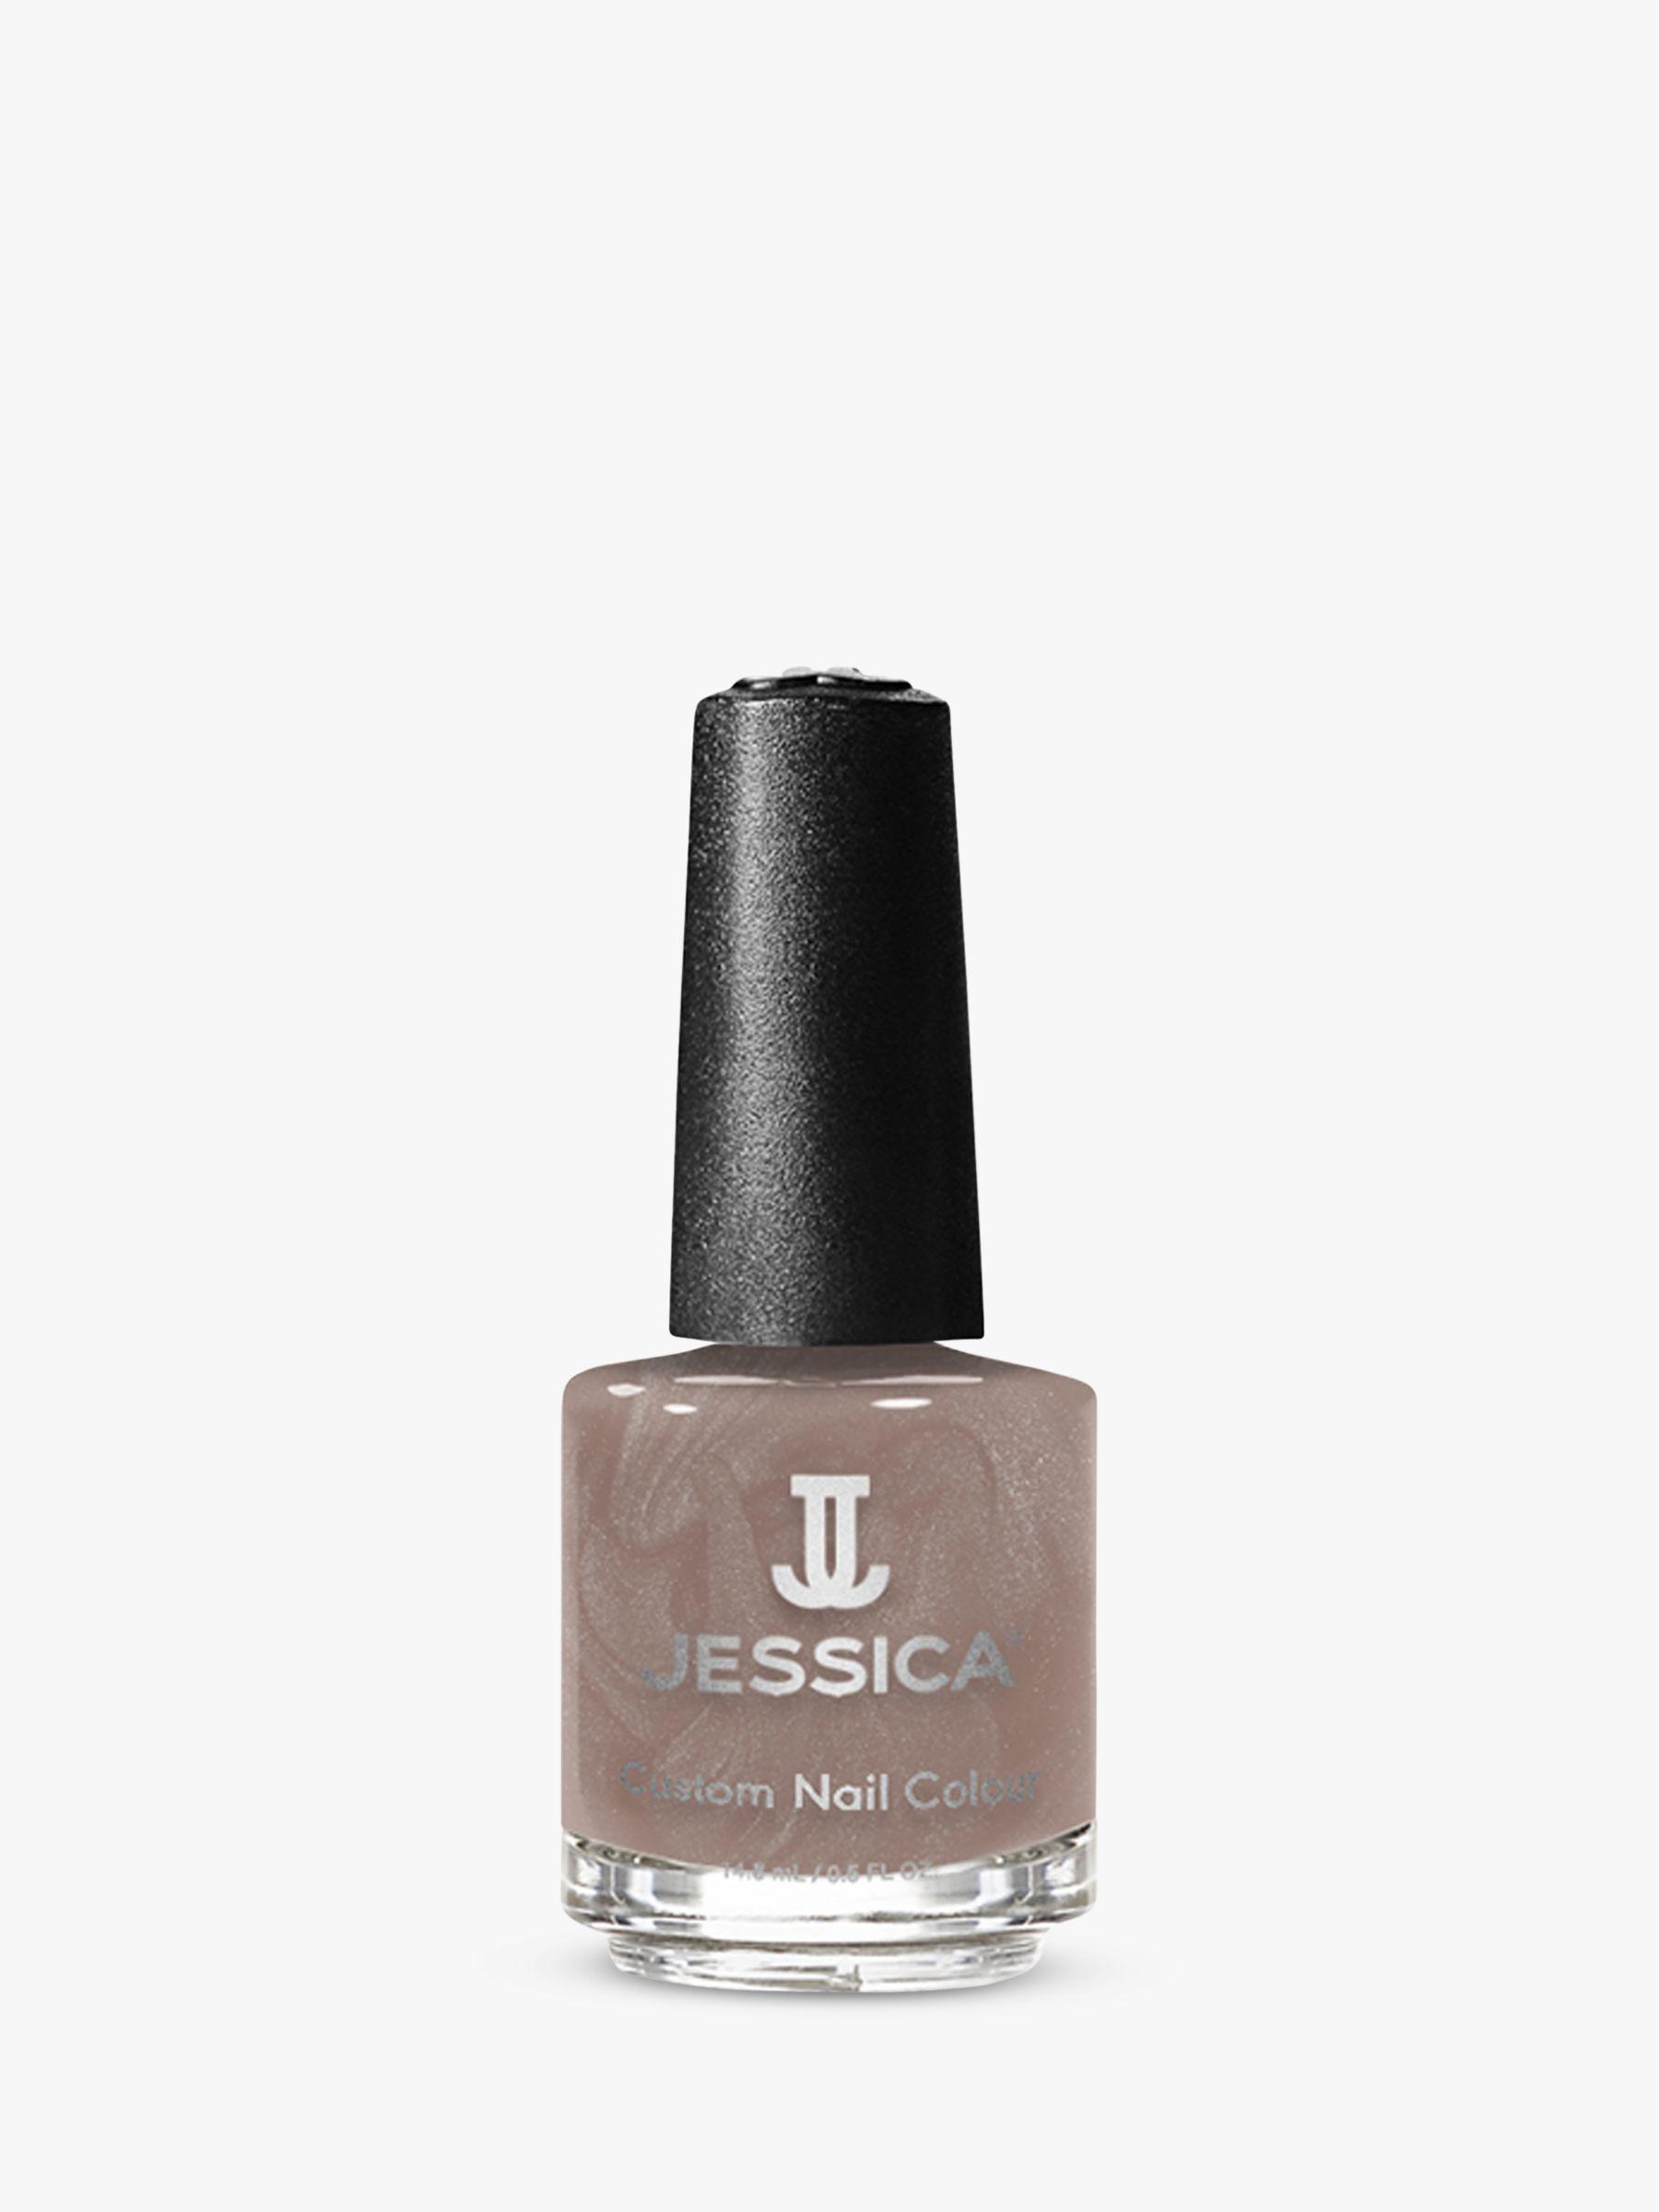 Jessica Jessica Custom Nail Colour - Glitters